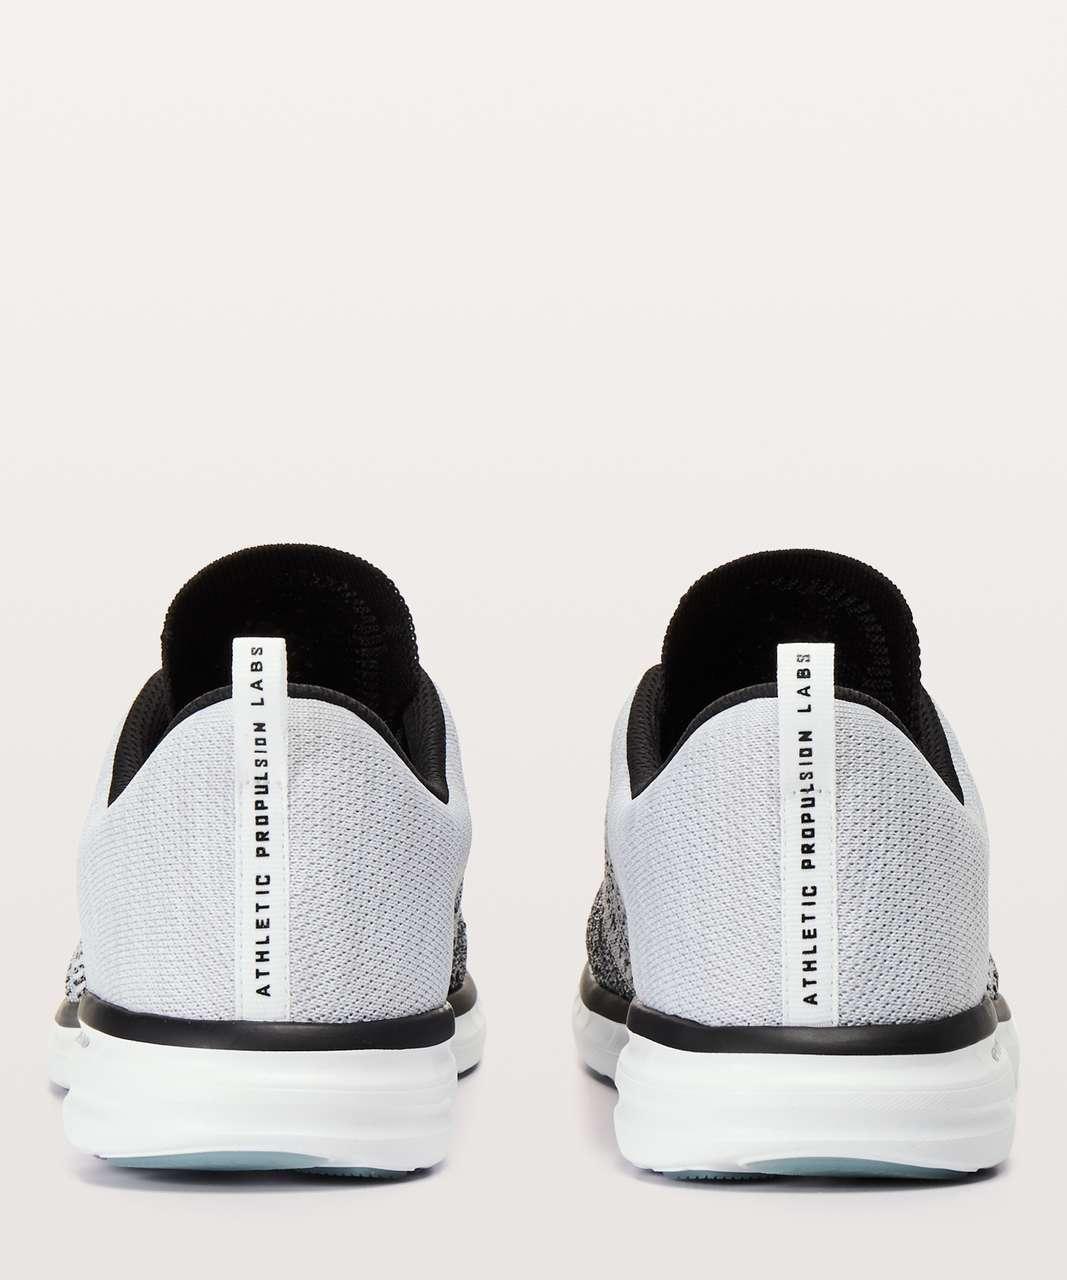 Lululemon Mens TechLoom Pro Shoe